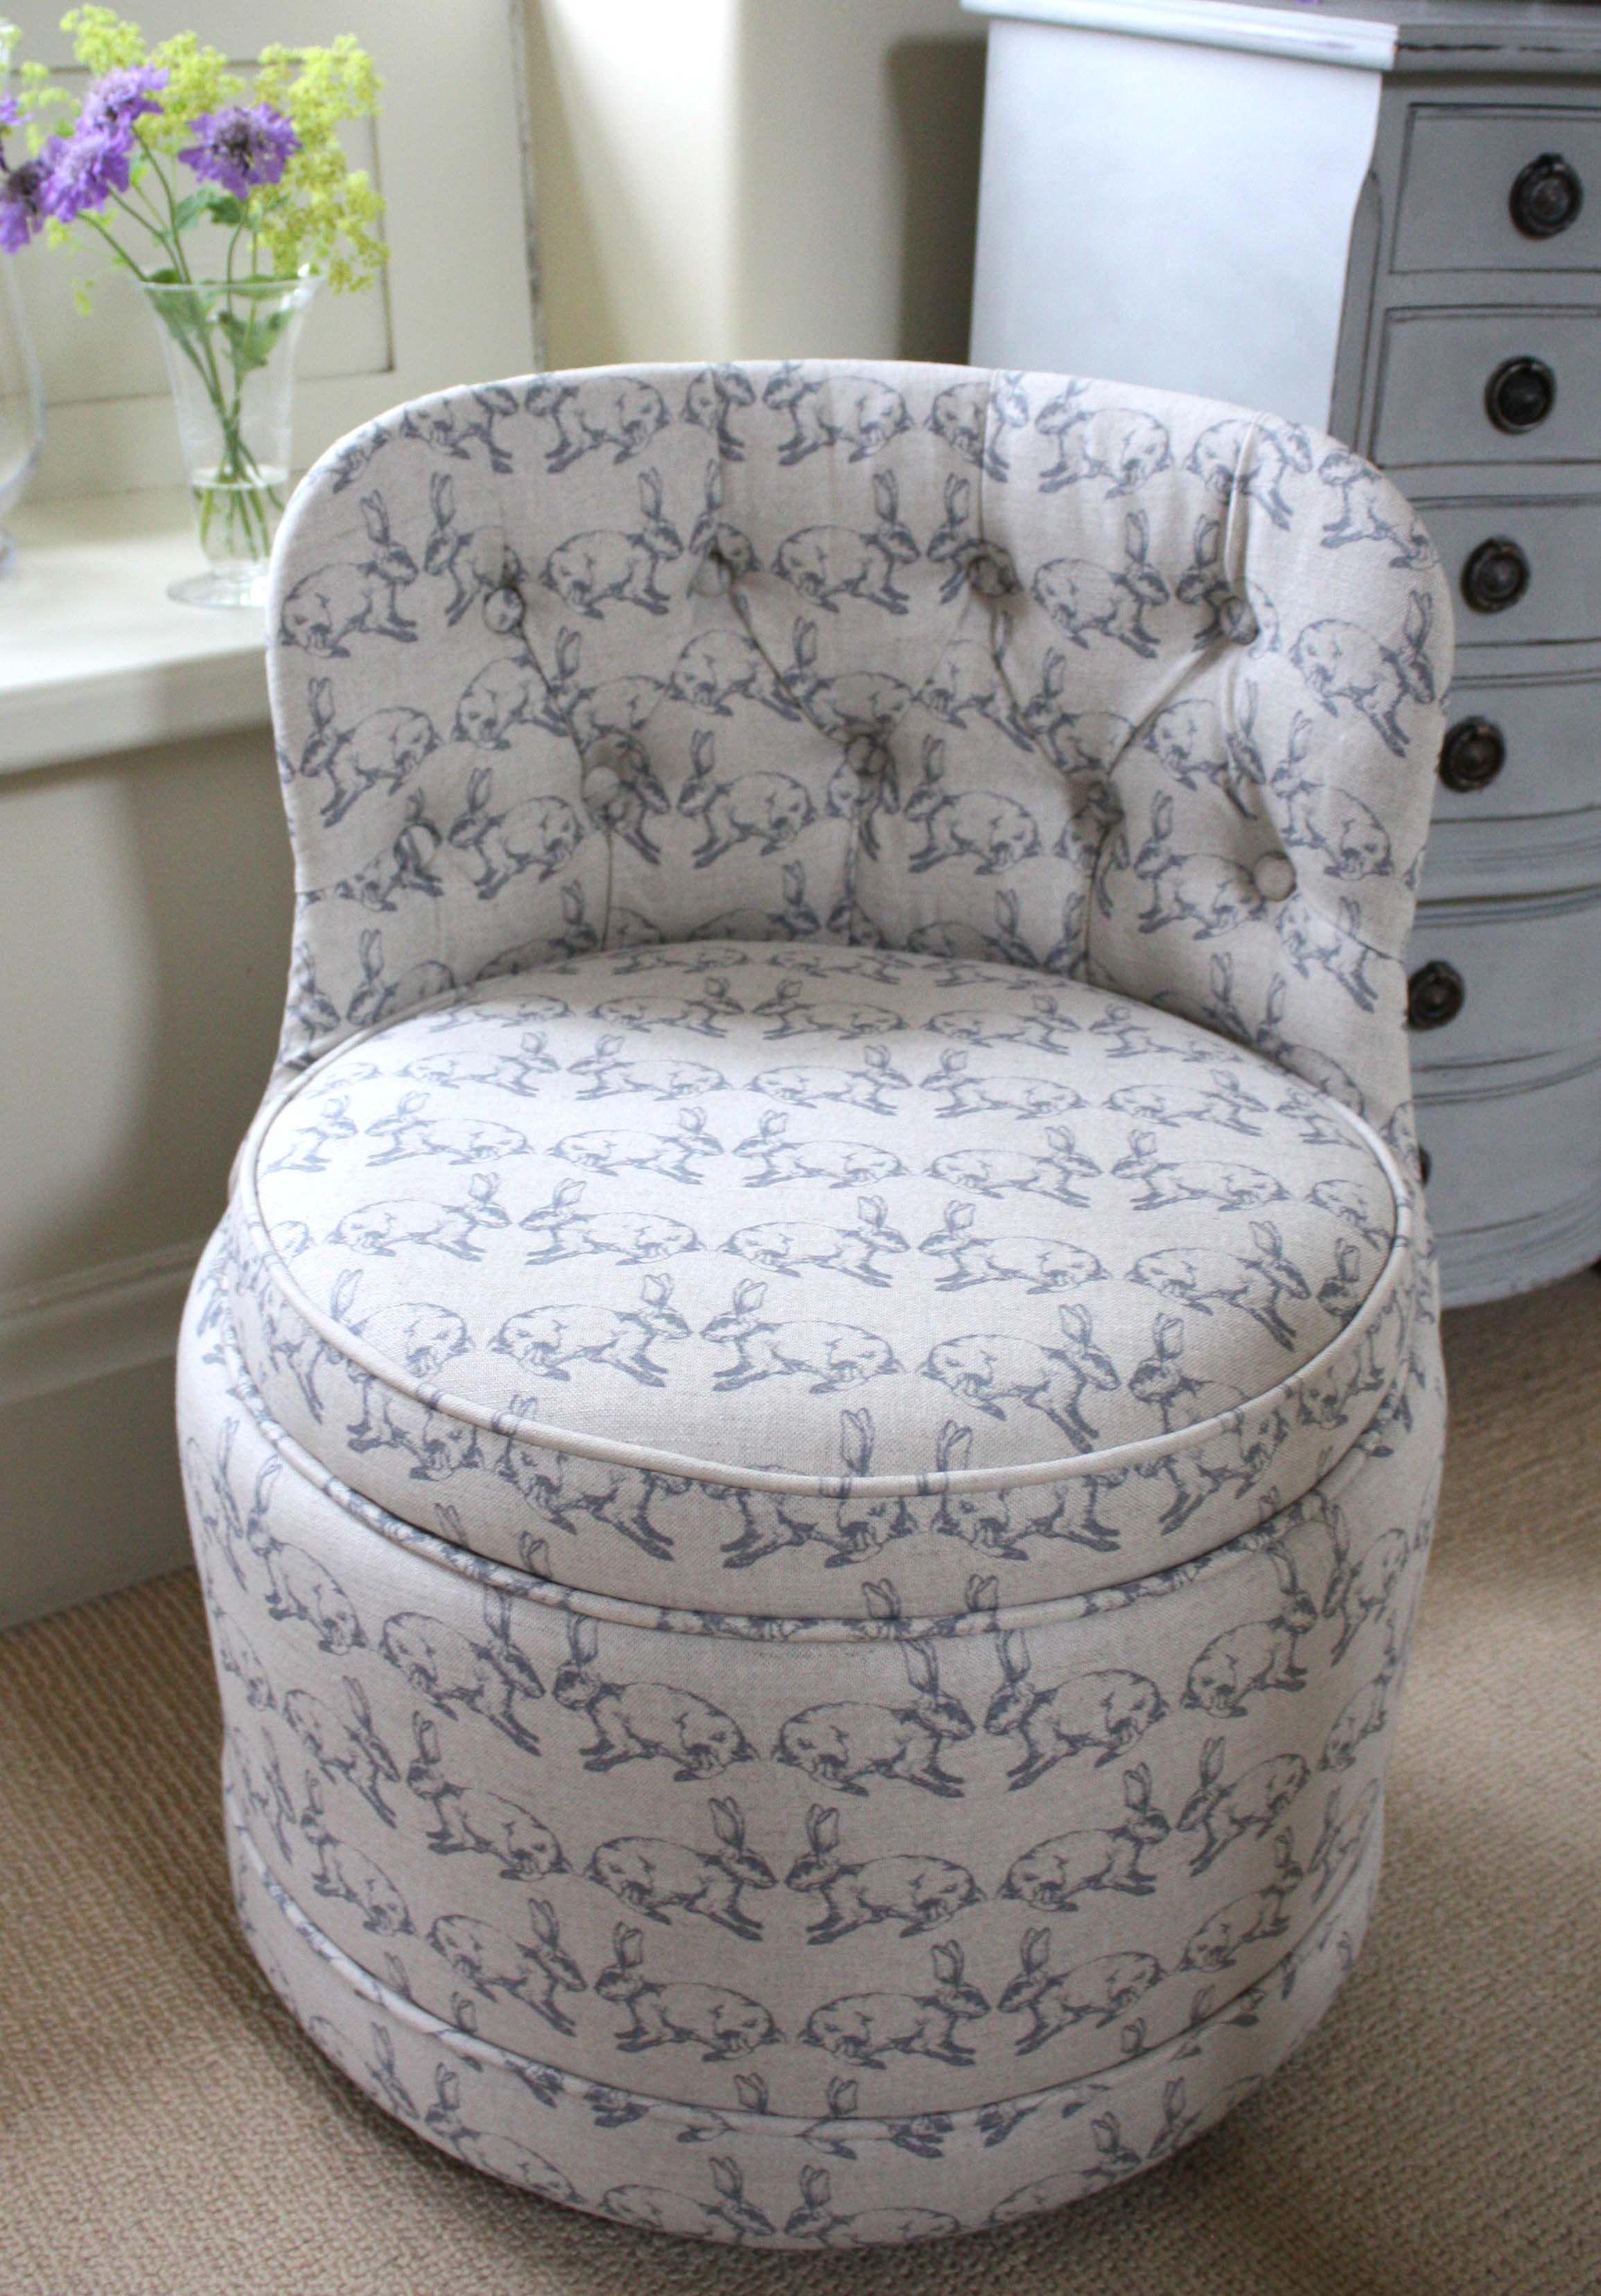 sold nursery bedroom chair upholstered in rabbits linen fabric rh pinterest com